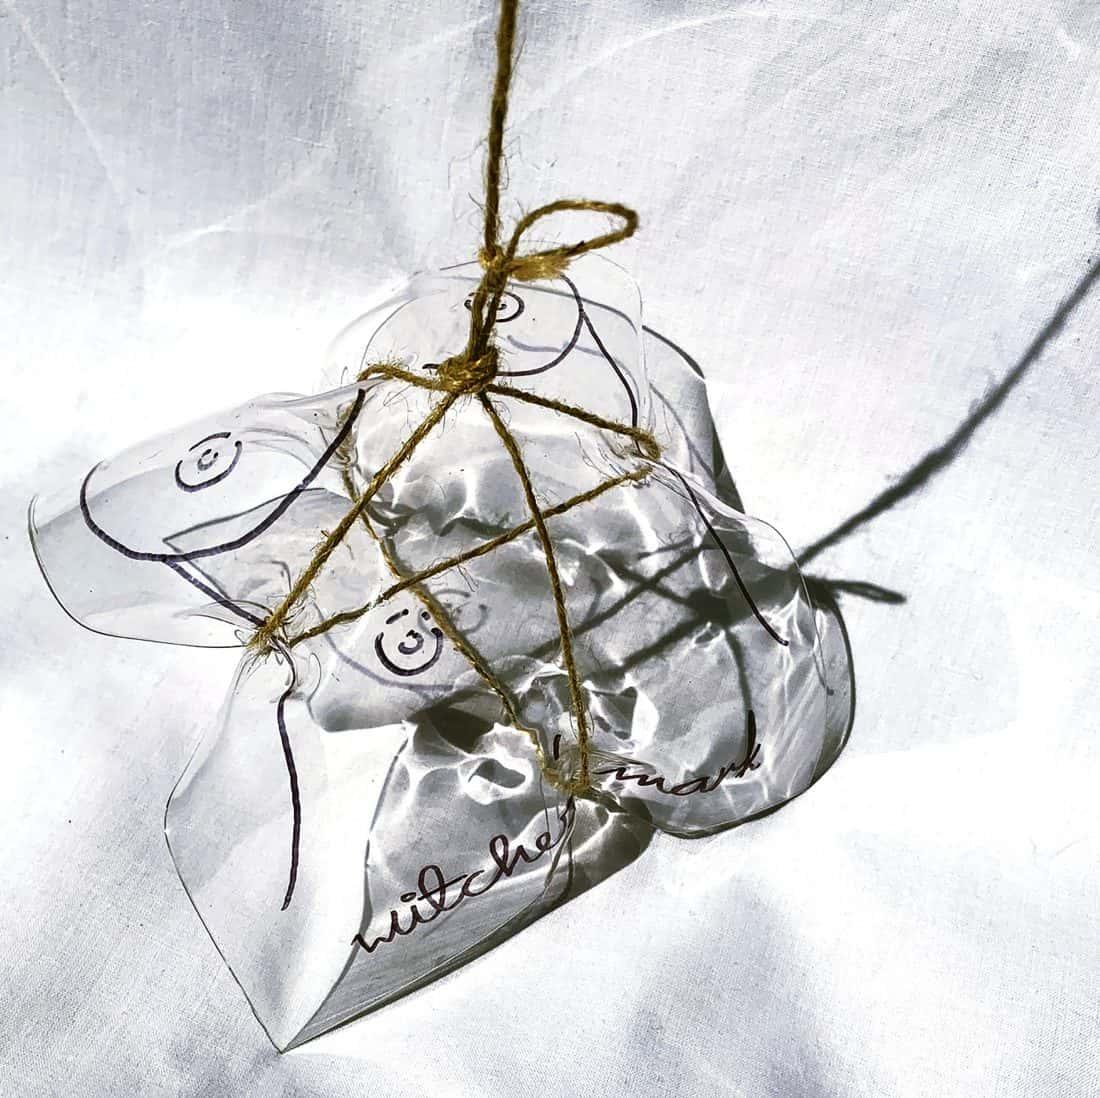 Georgia Stevie Robinson, Glass and Ceramics, Untitled 4